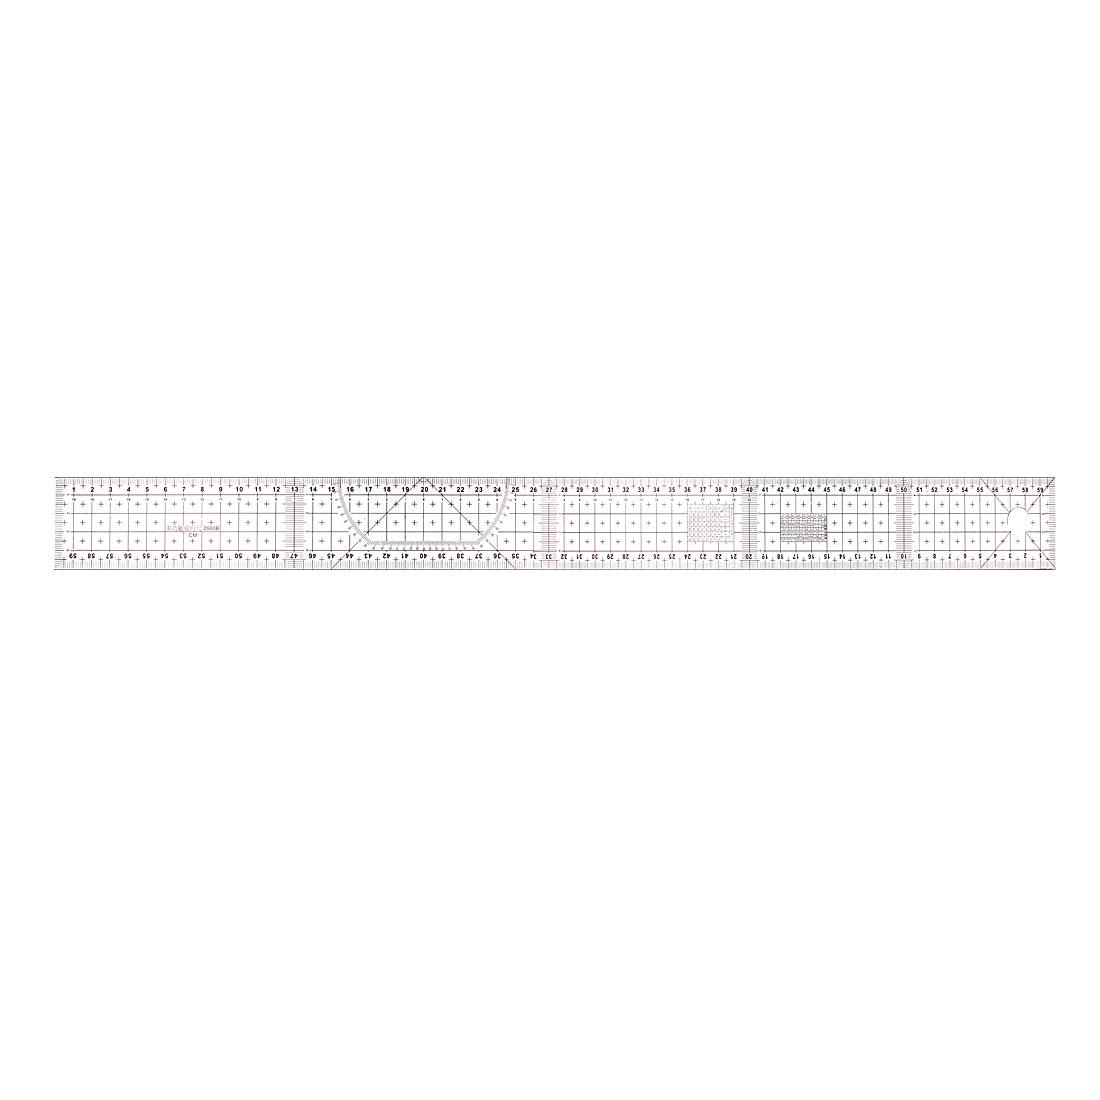 Beveled Ruler 60cm Plastic Transparent Sewing Tool B60